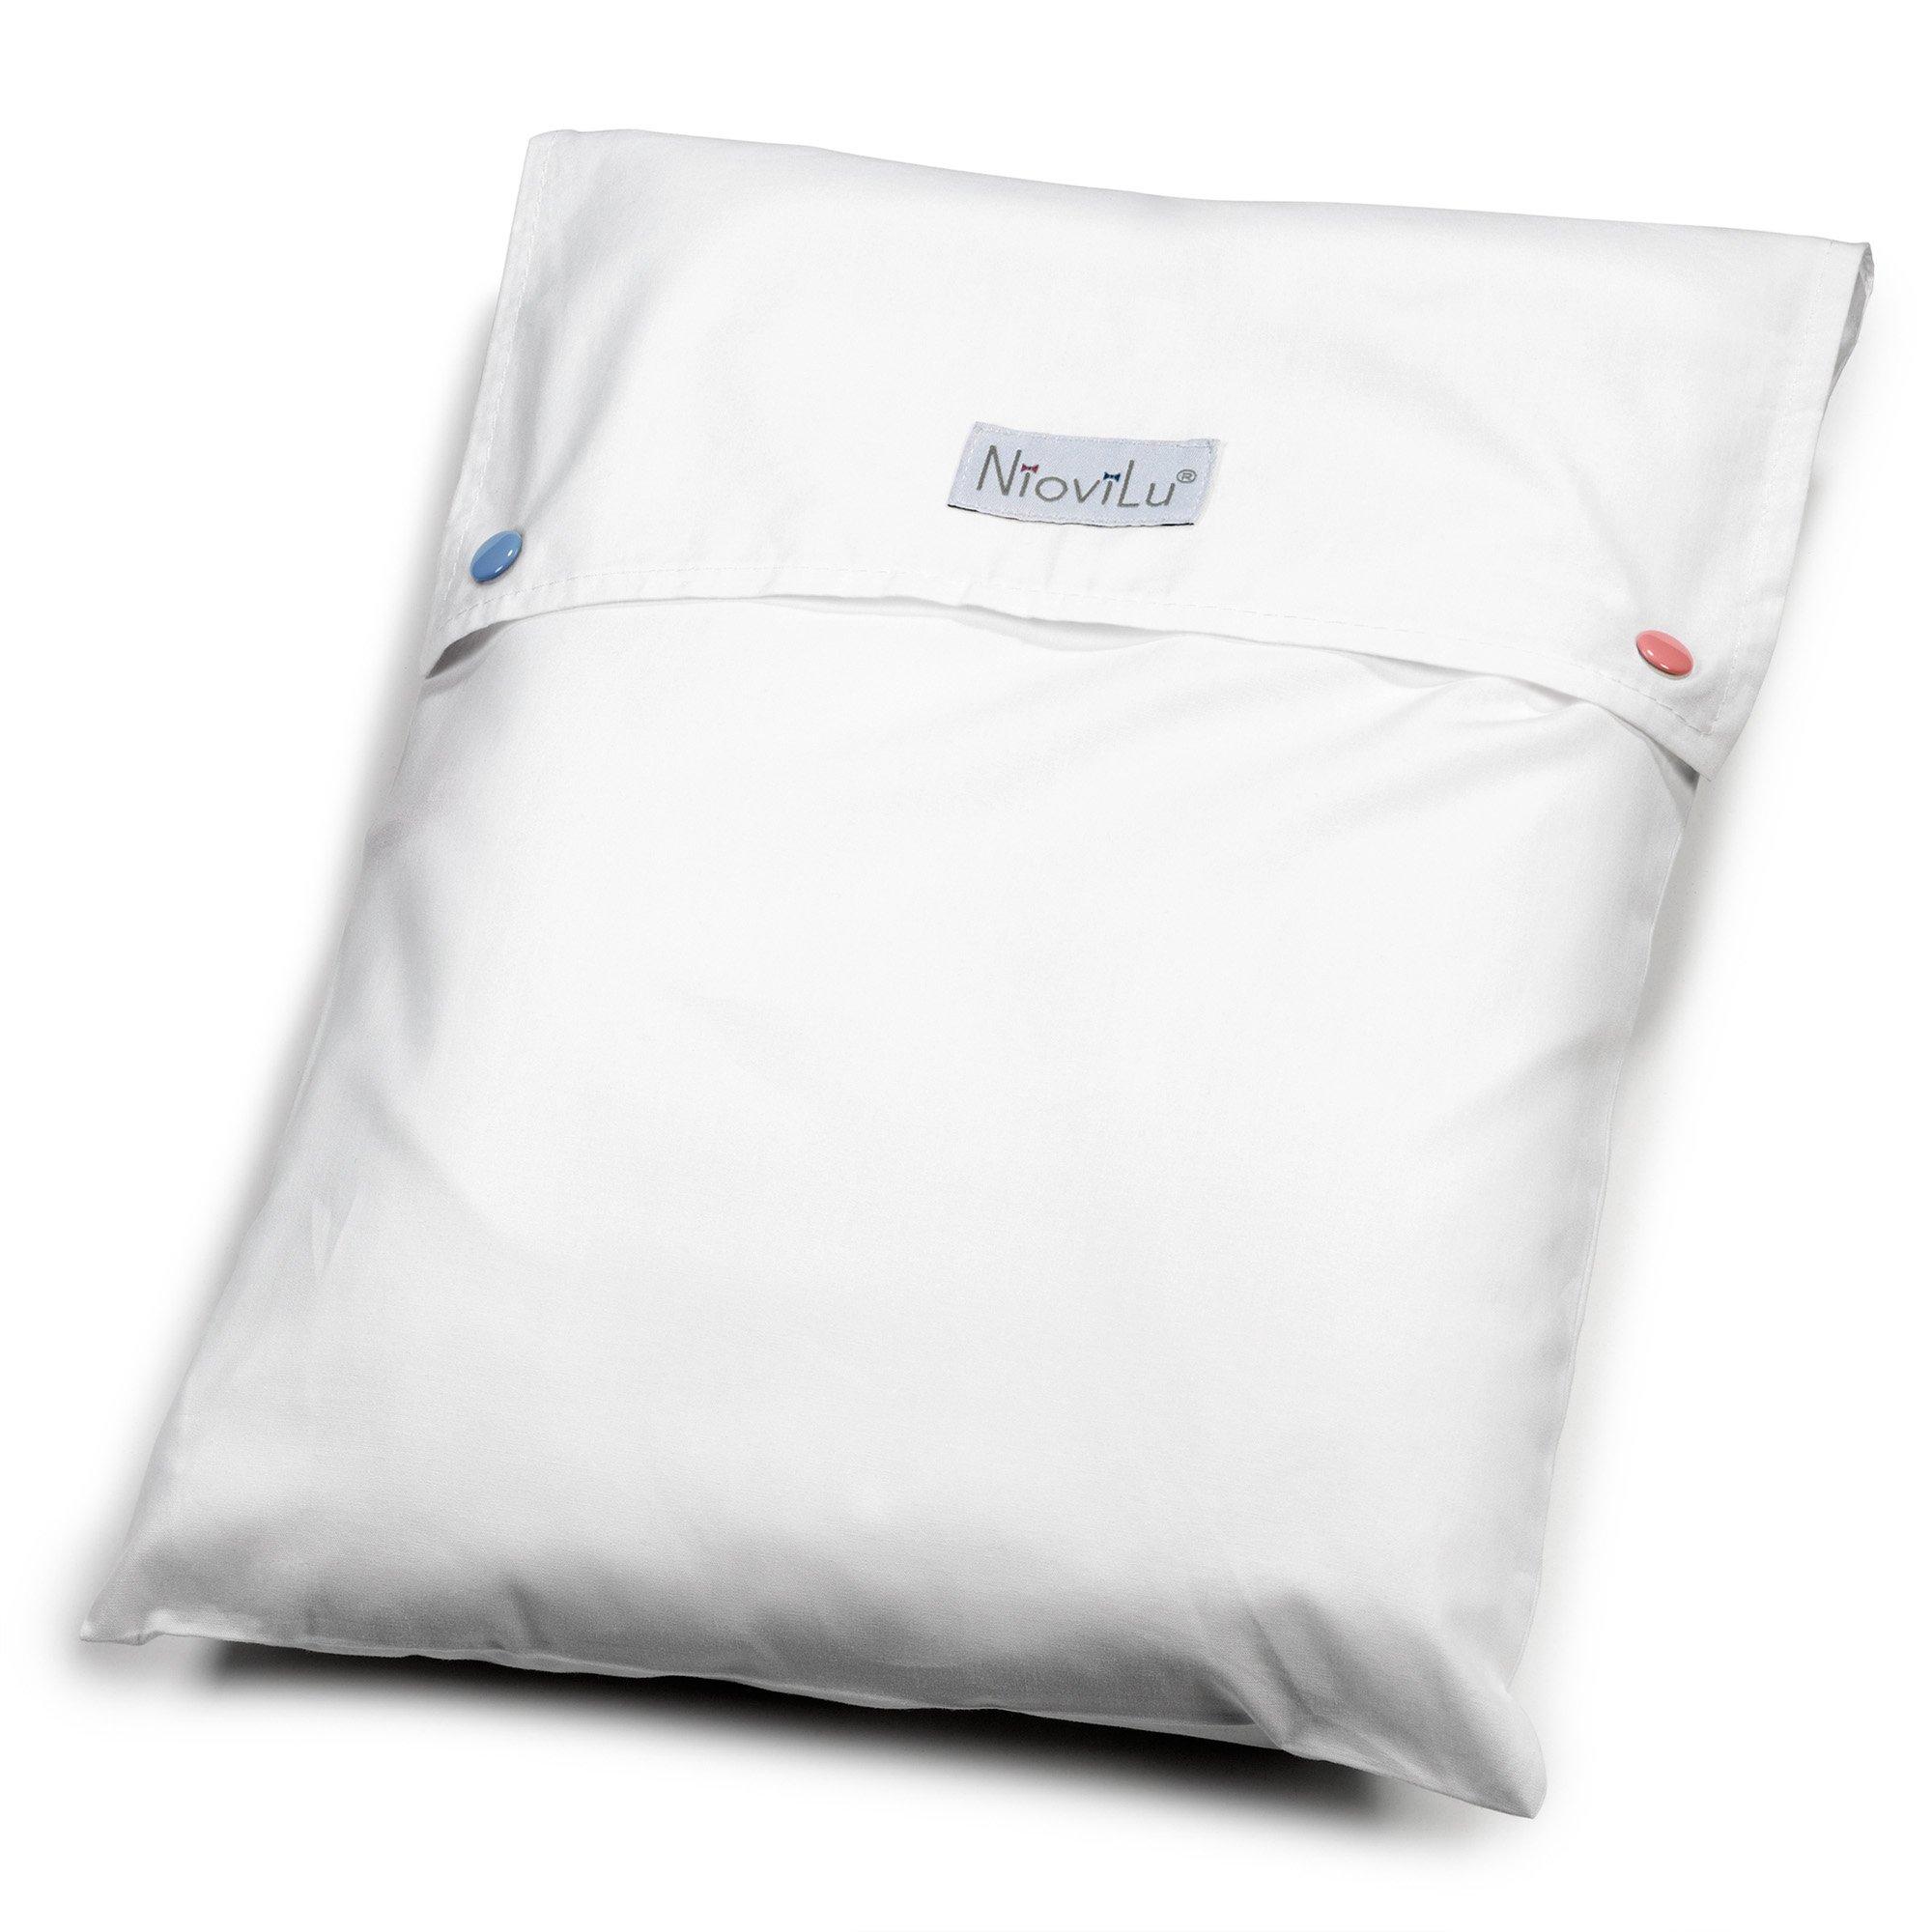 NioviLu Baby Design Sleeping Sack - Plouf (18-36 Months / 41.3 in. - 3.5 Tog)